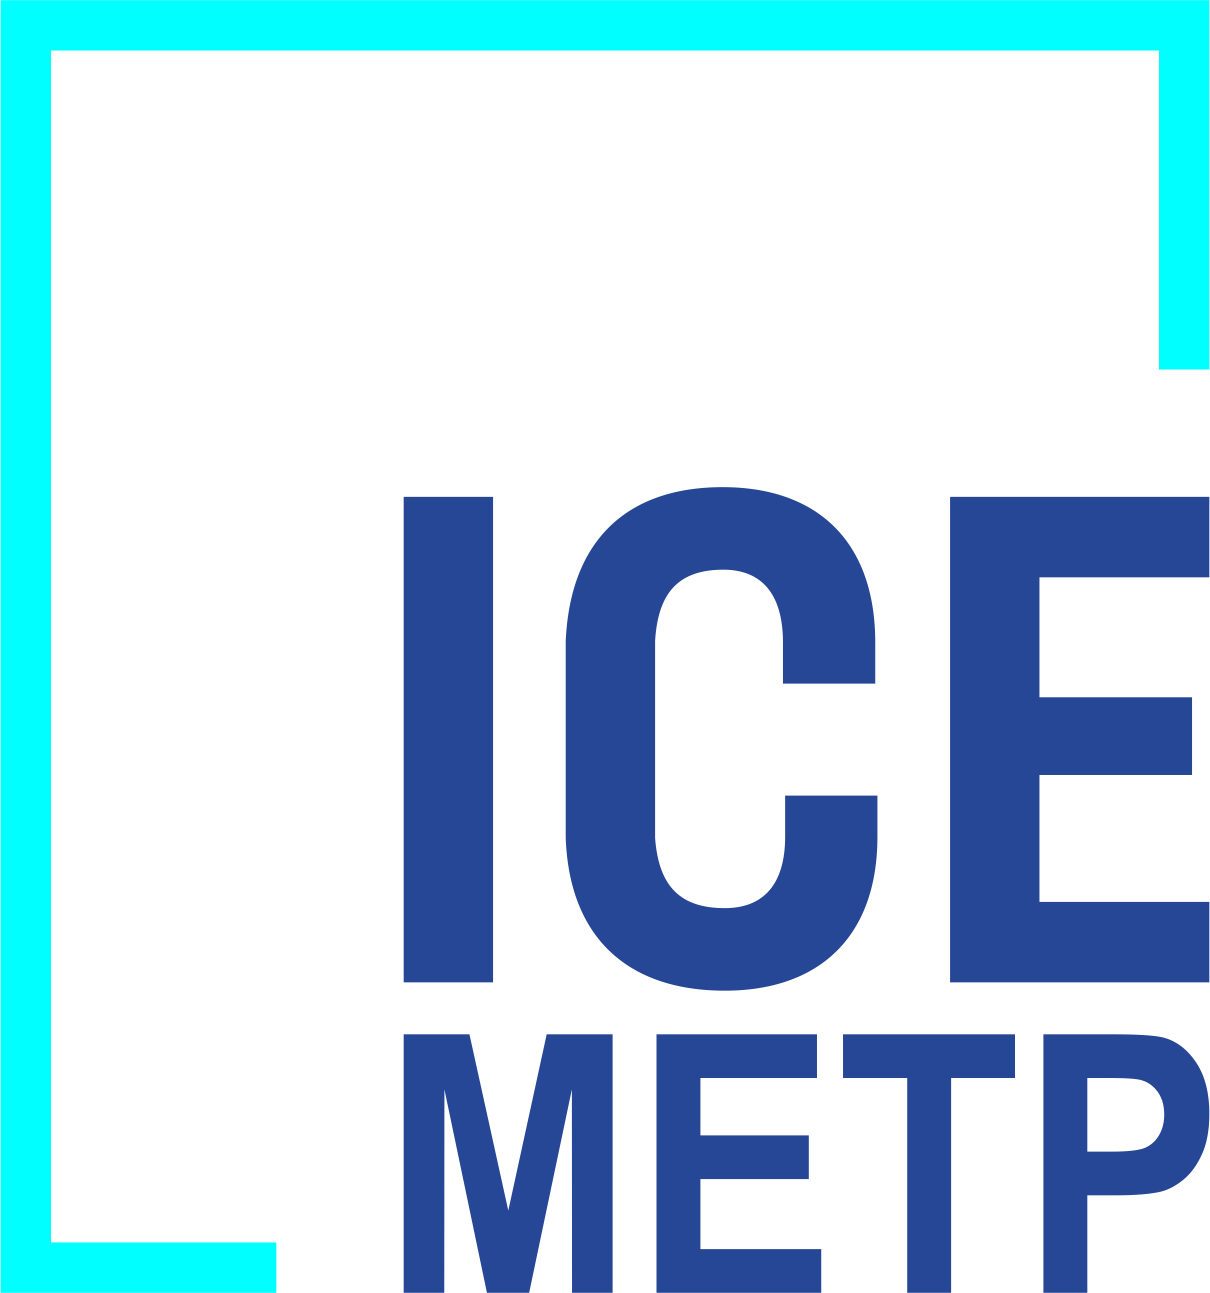 IceМетр